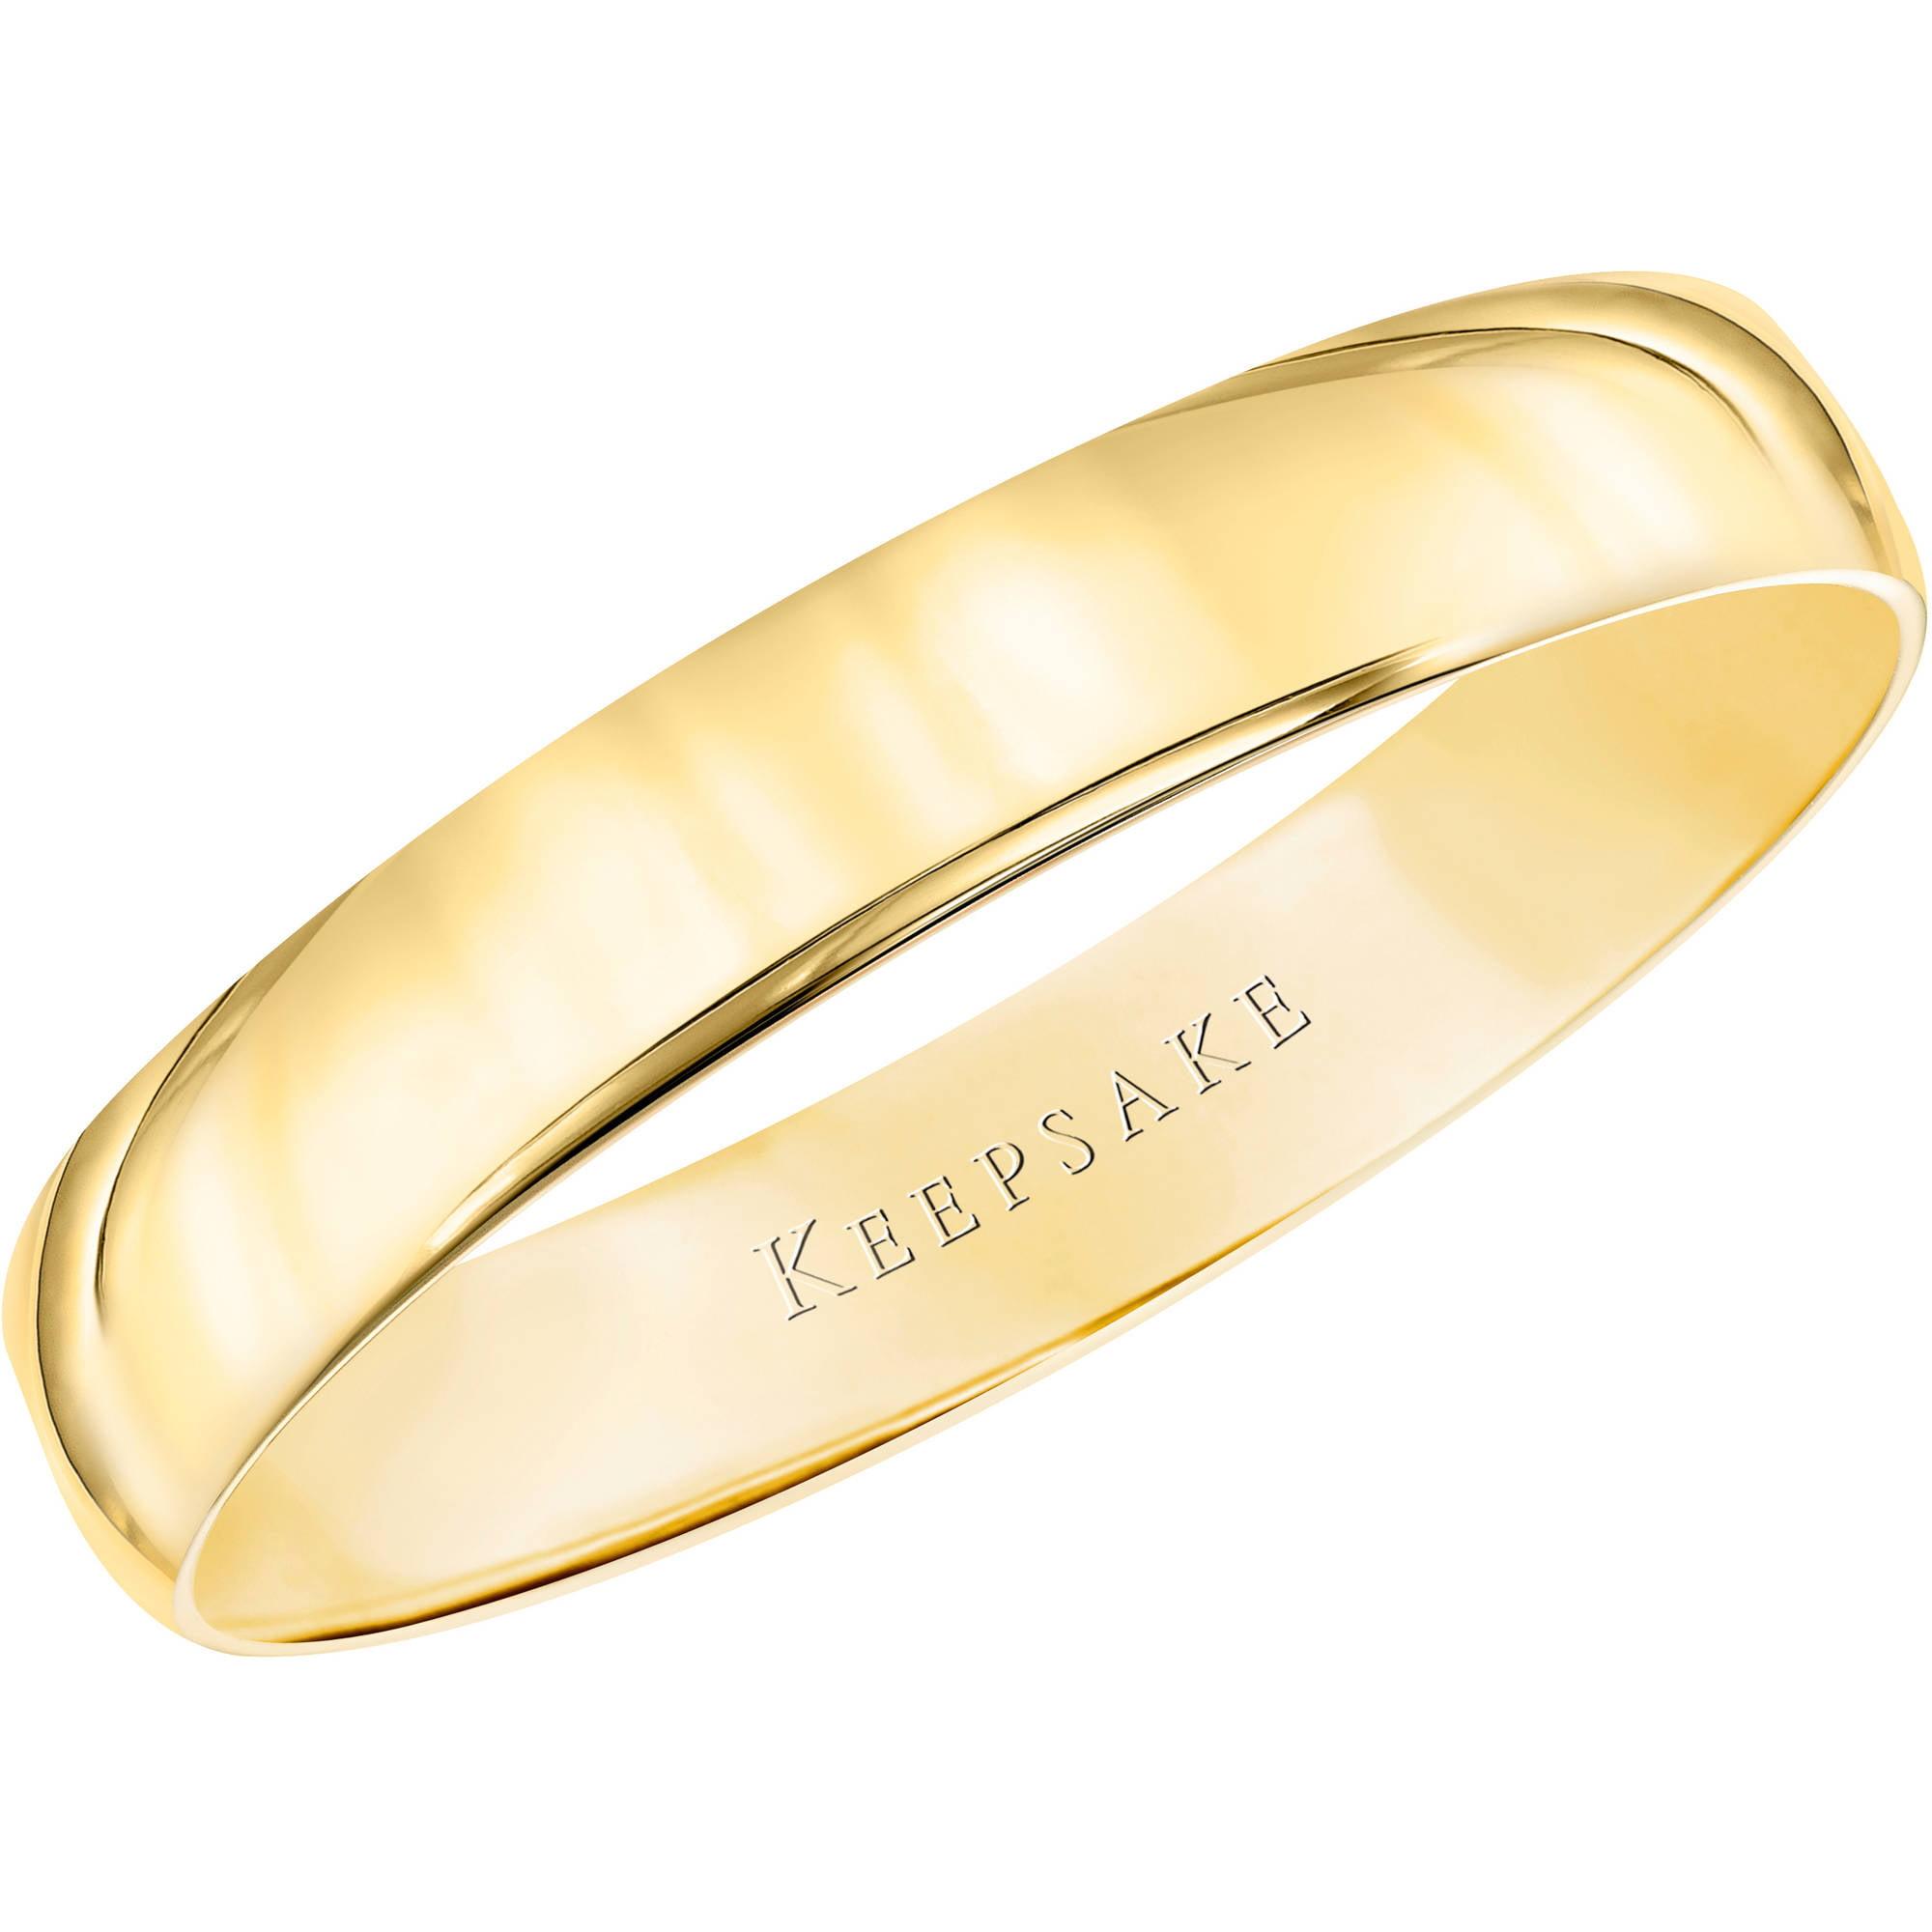 Keepsake 10kt Yellow Gold Wedding Band, 4mm